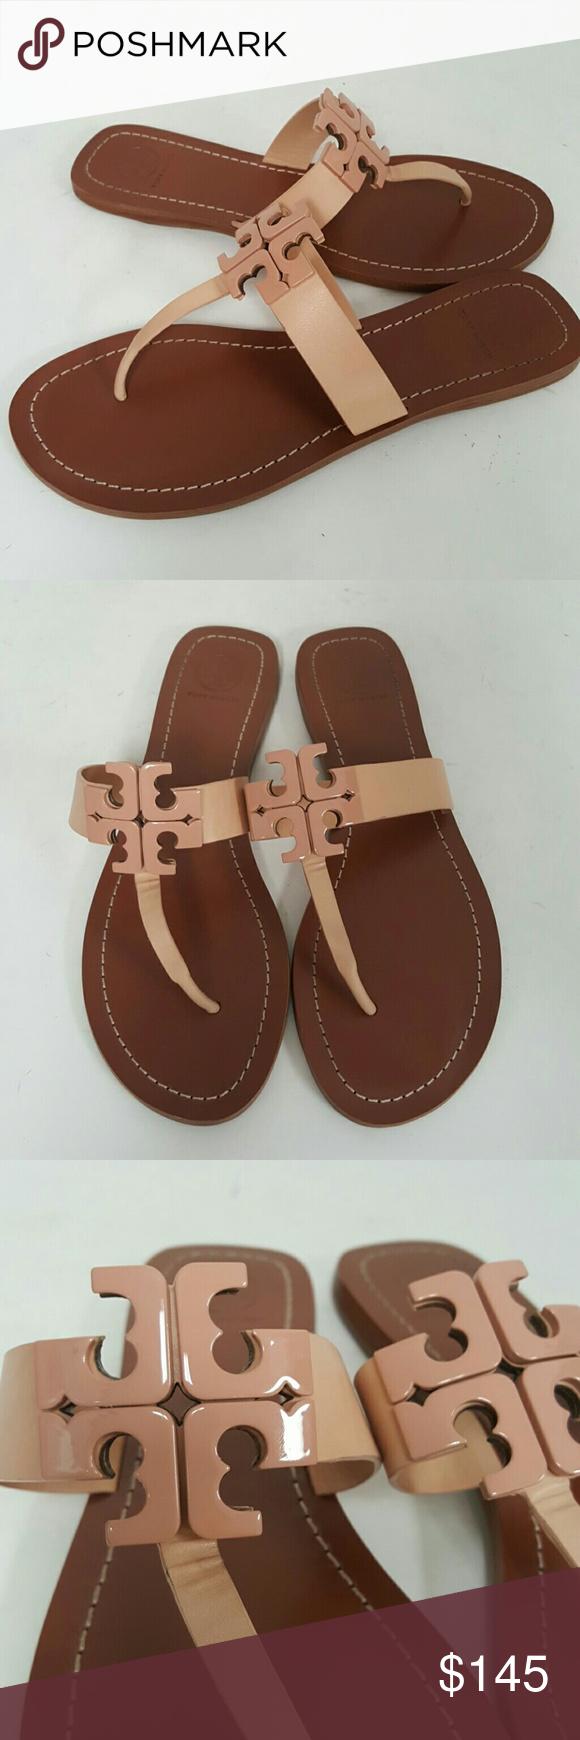 b4bda4b1f0e8 Tory burch light oak moore 2 thong sandal US 9 great mint condition Tory  Burch Shoes Sandals